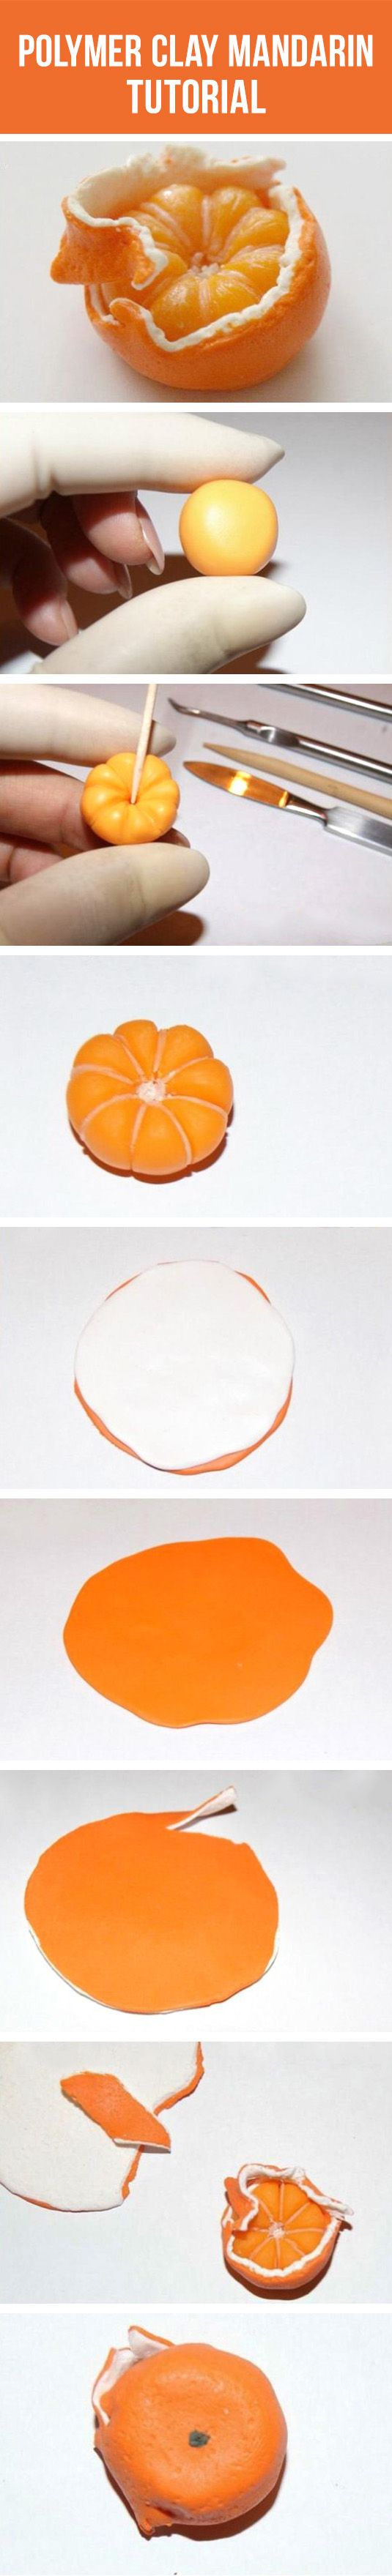 Mandarina deliciosa con arcilla polimérica